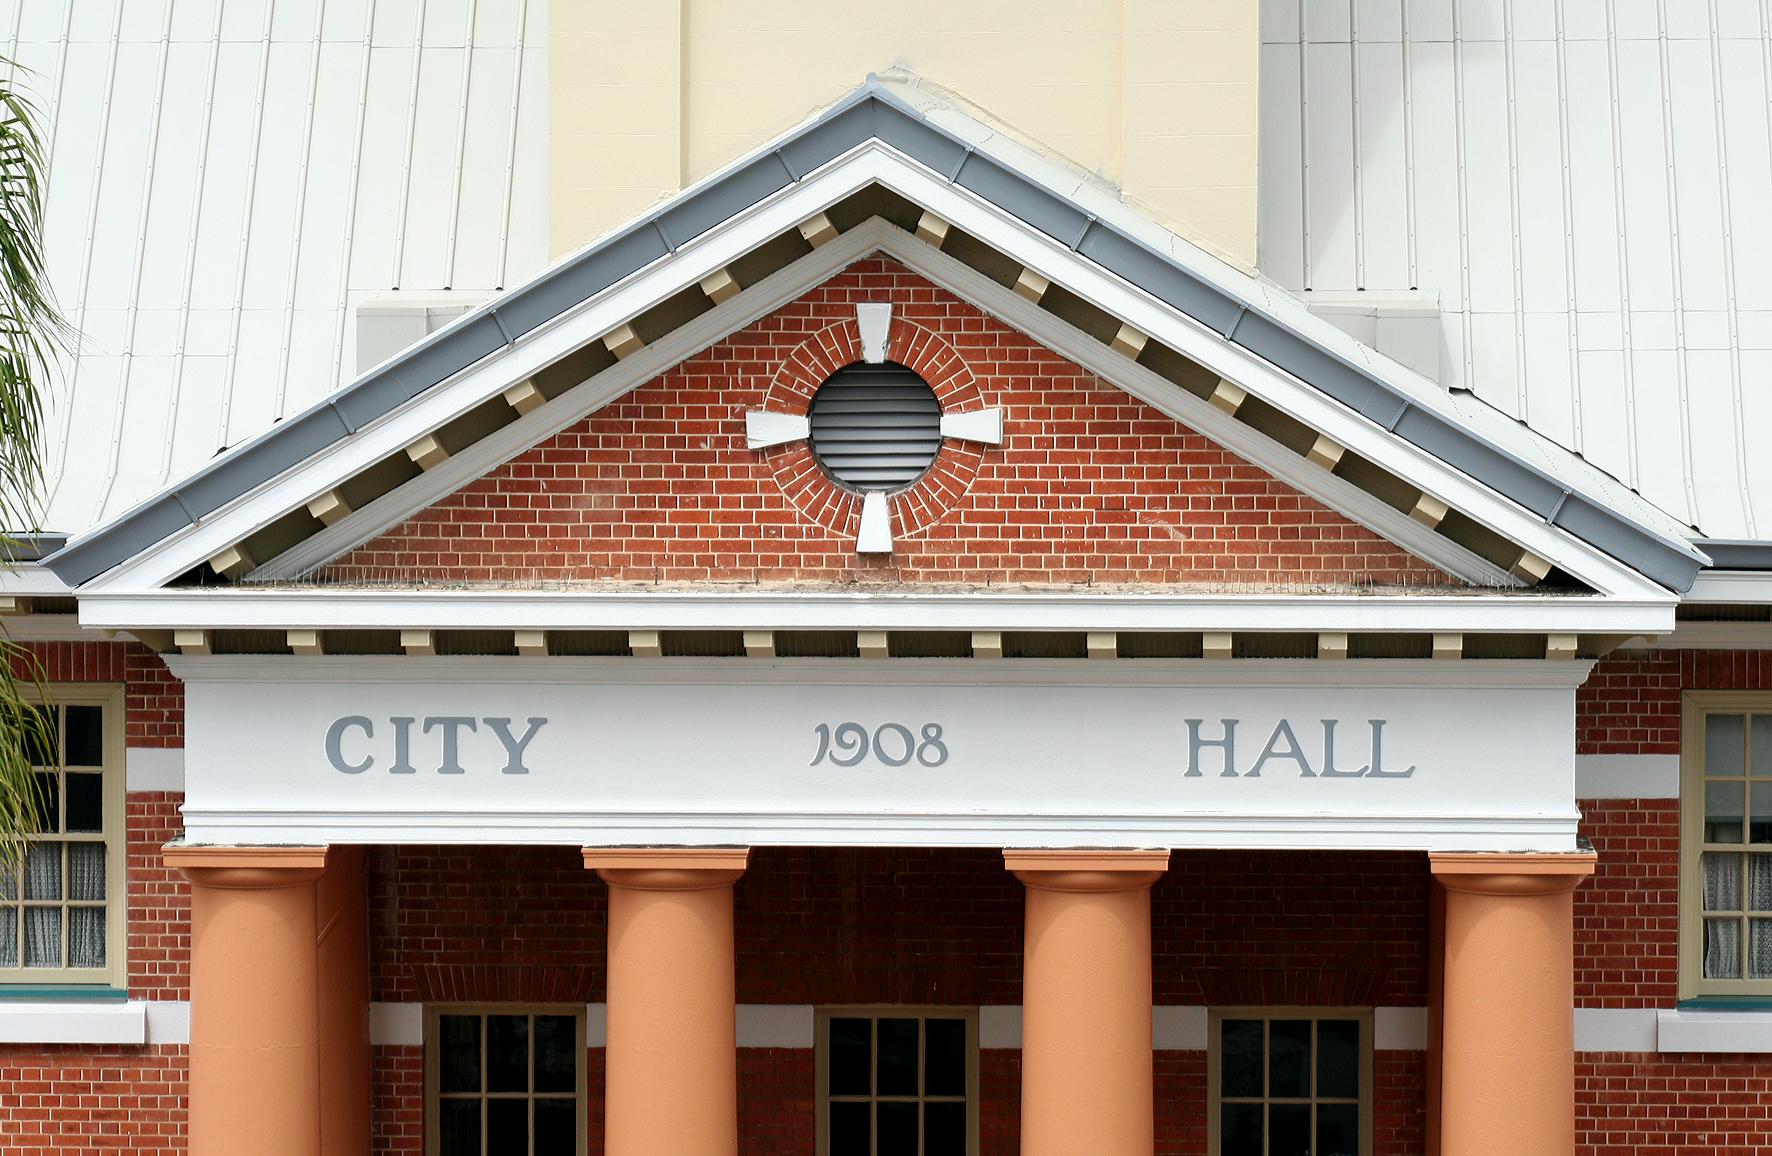 Maryborough City Hall Logo and Images